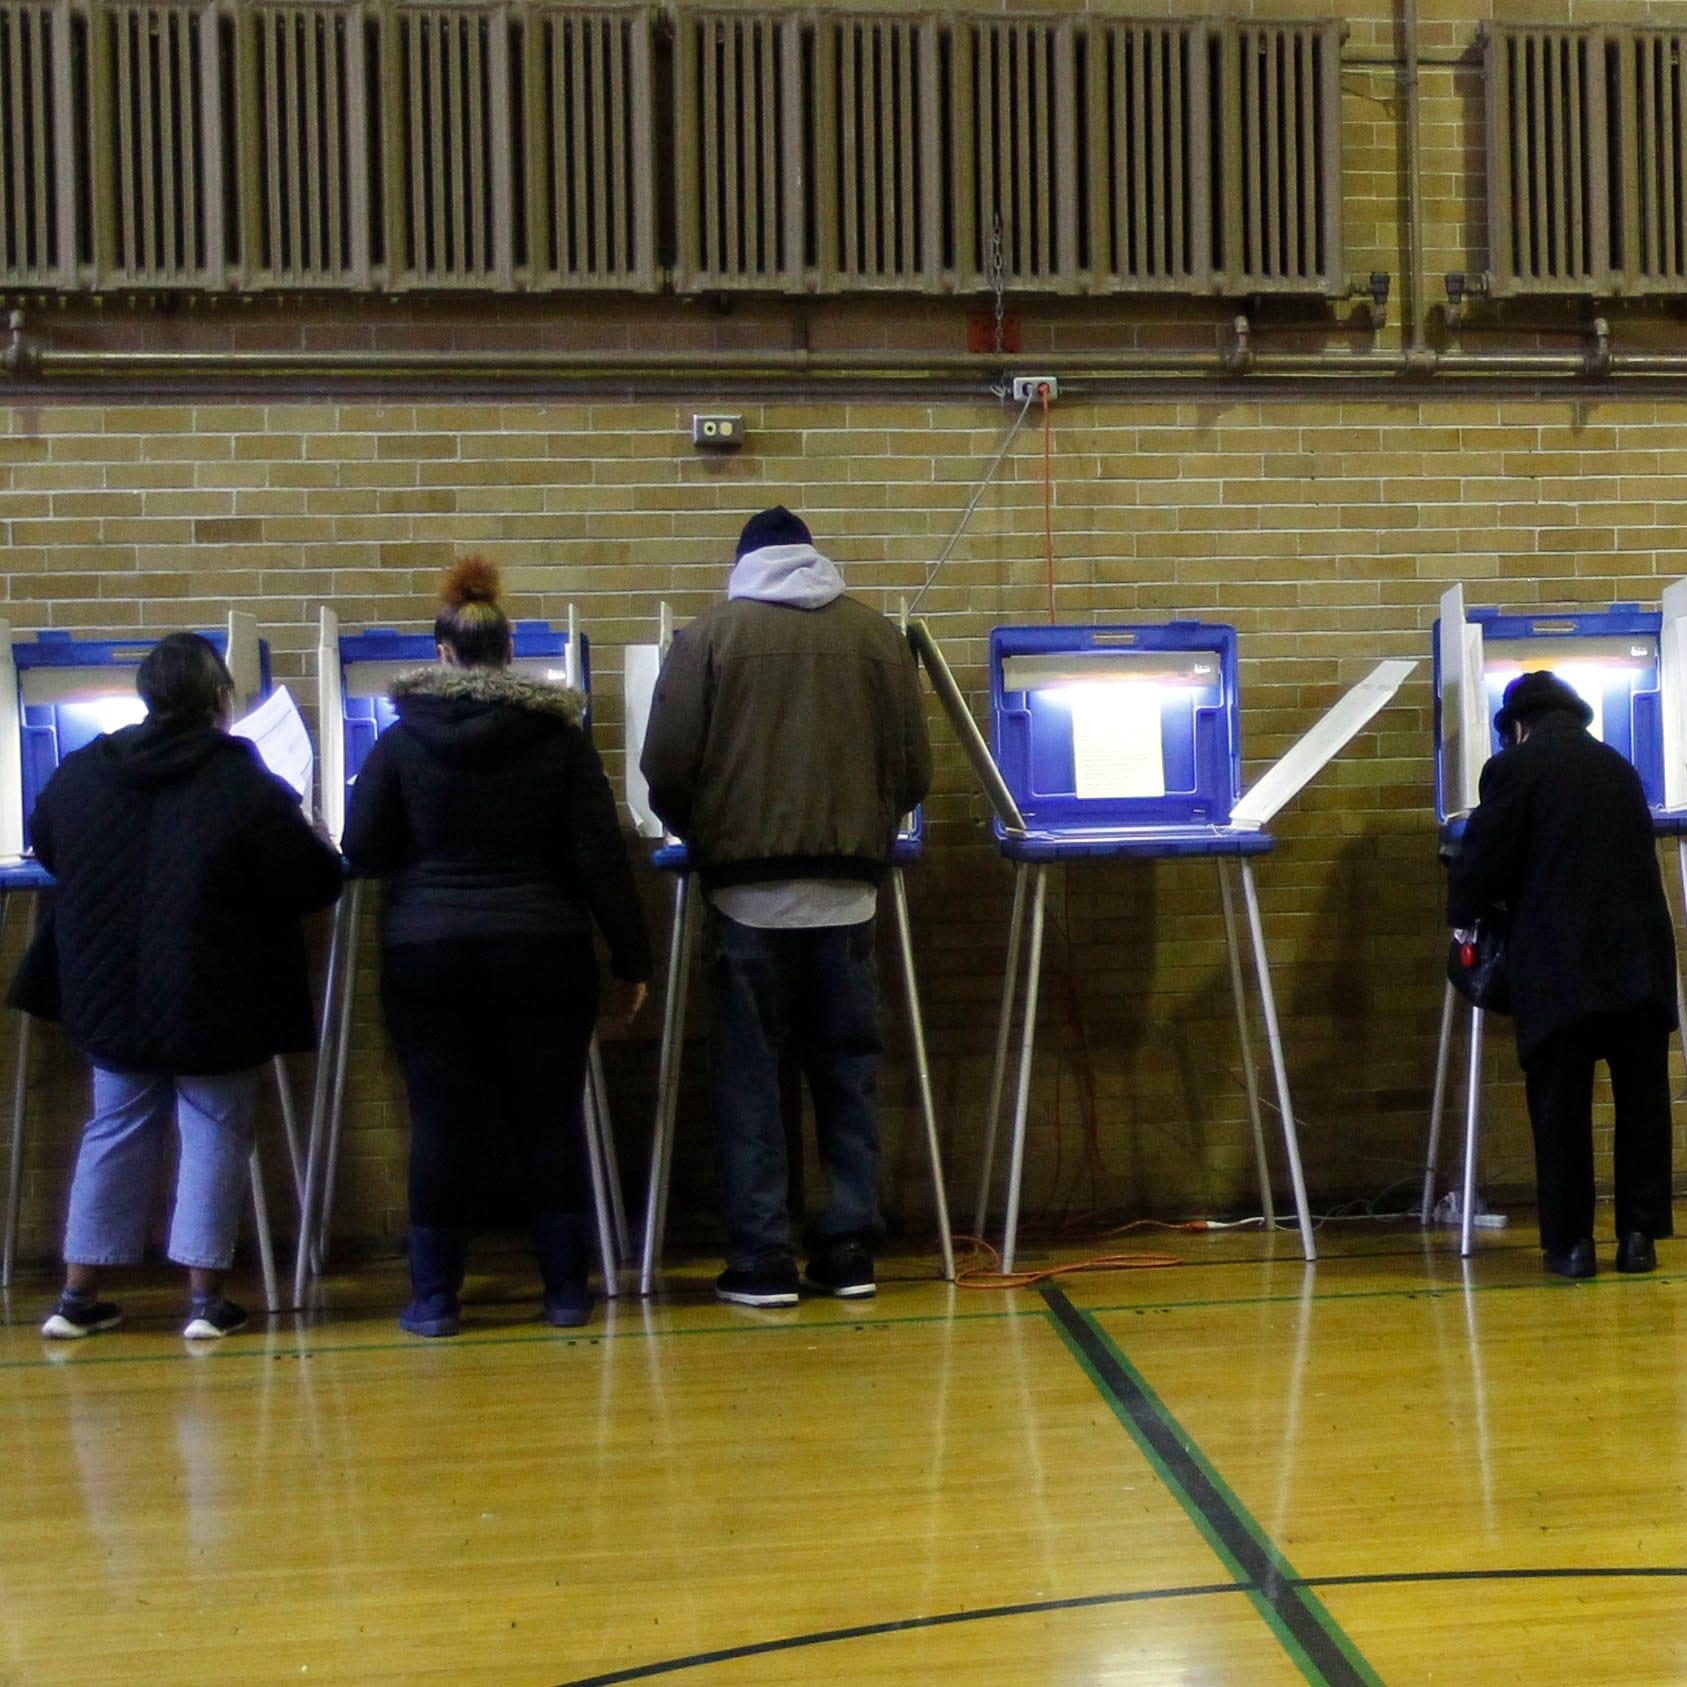 Liberal groups ask judge to overturn early voting limits Gov. Scott Walker signed last week as part of lame-duck legislation